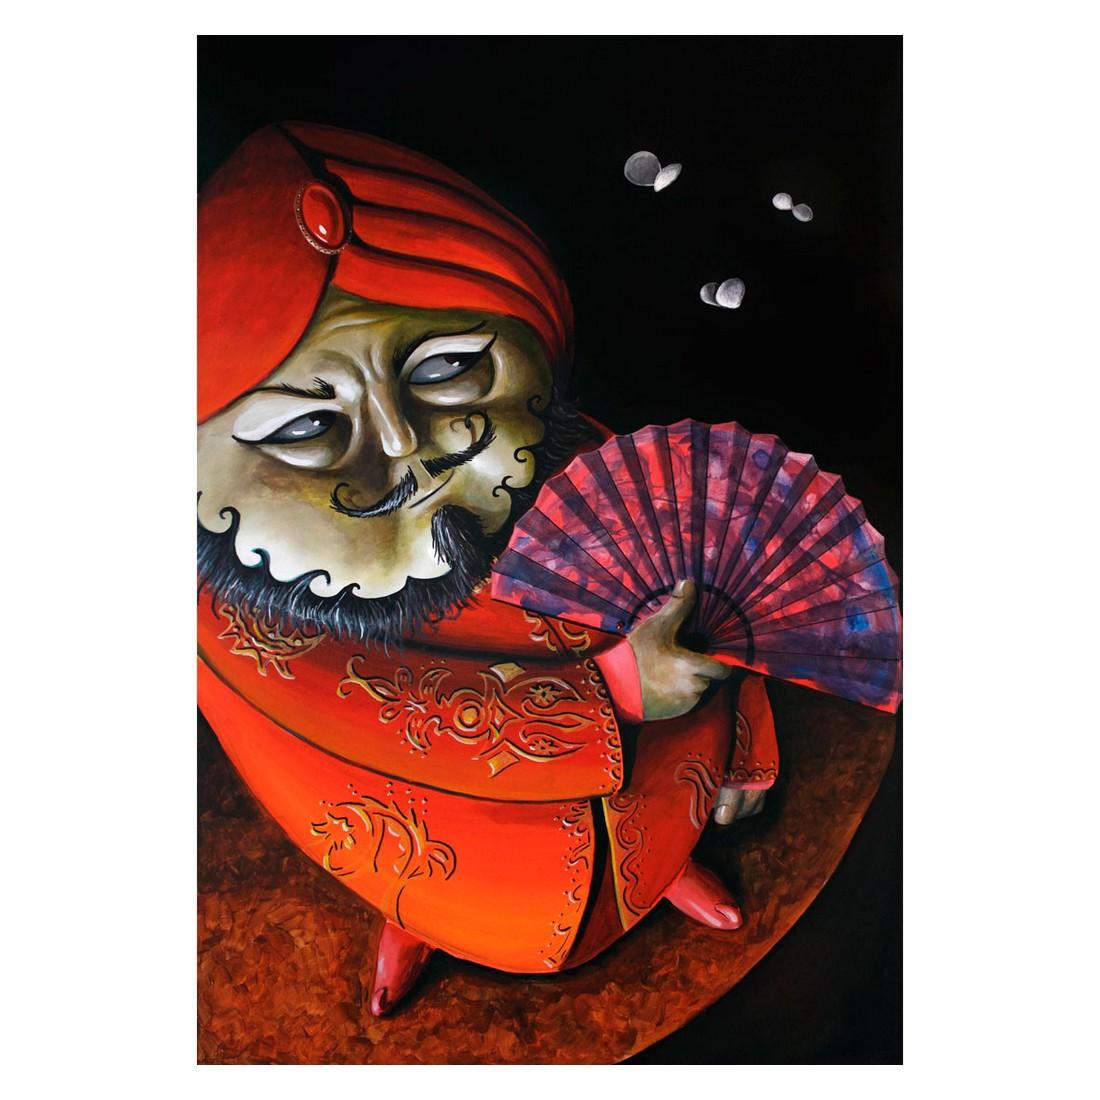 Ölgemälde Mystic Asia von Fabrini Crisci – Größe 80 x 60 cm, yourPainting bestellen